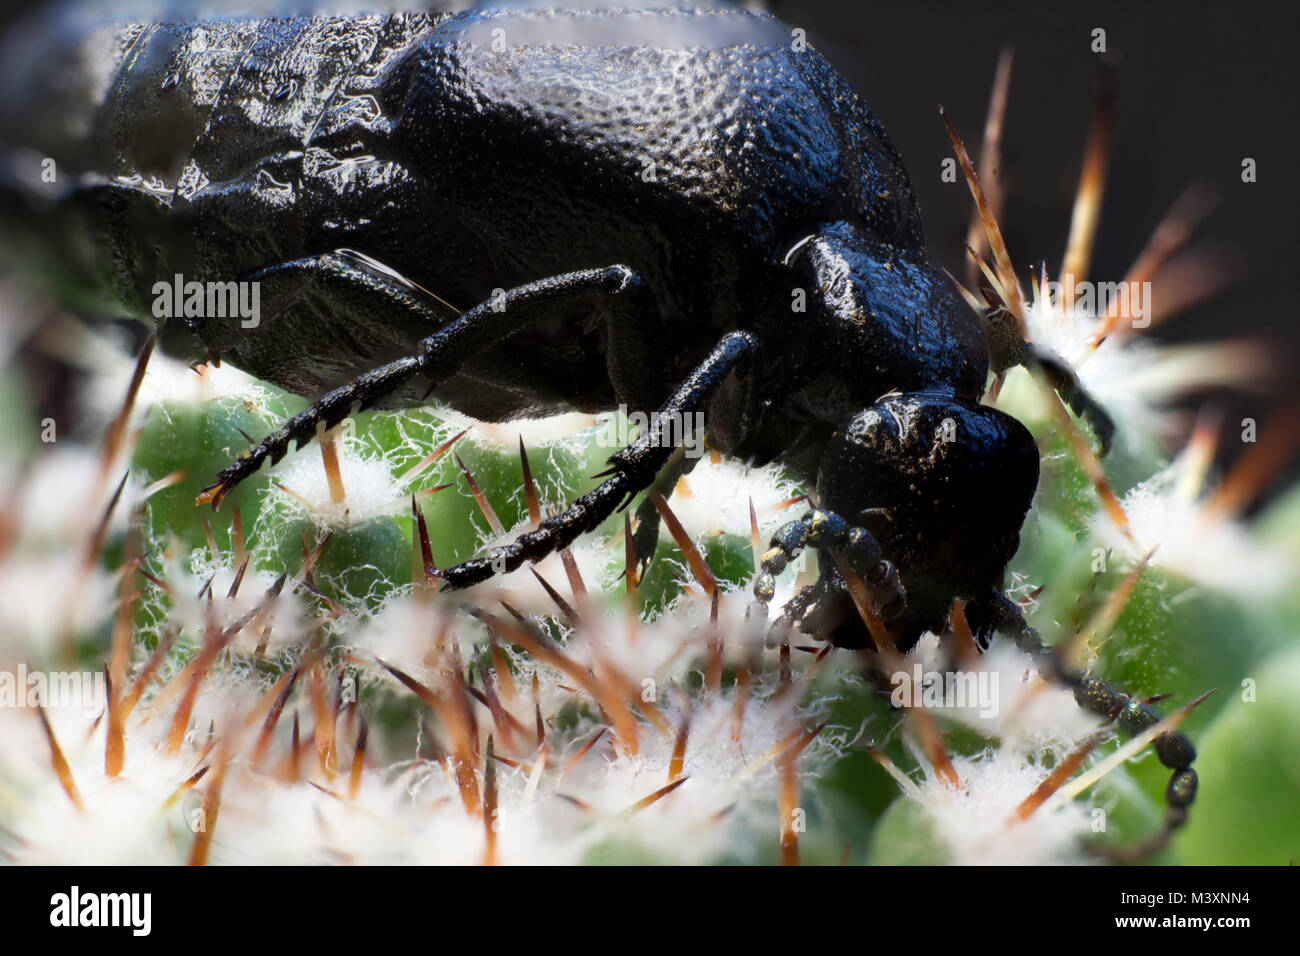 bug bottino tubo